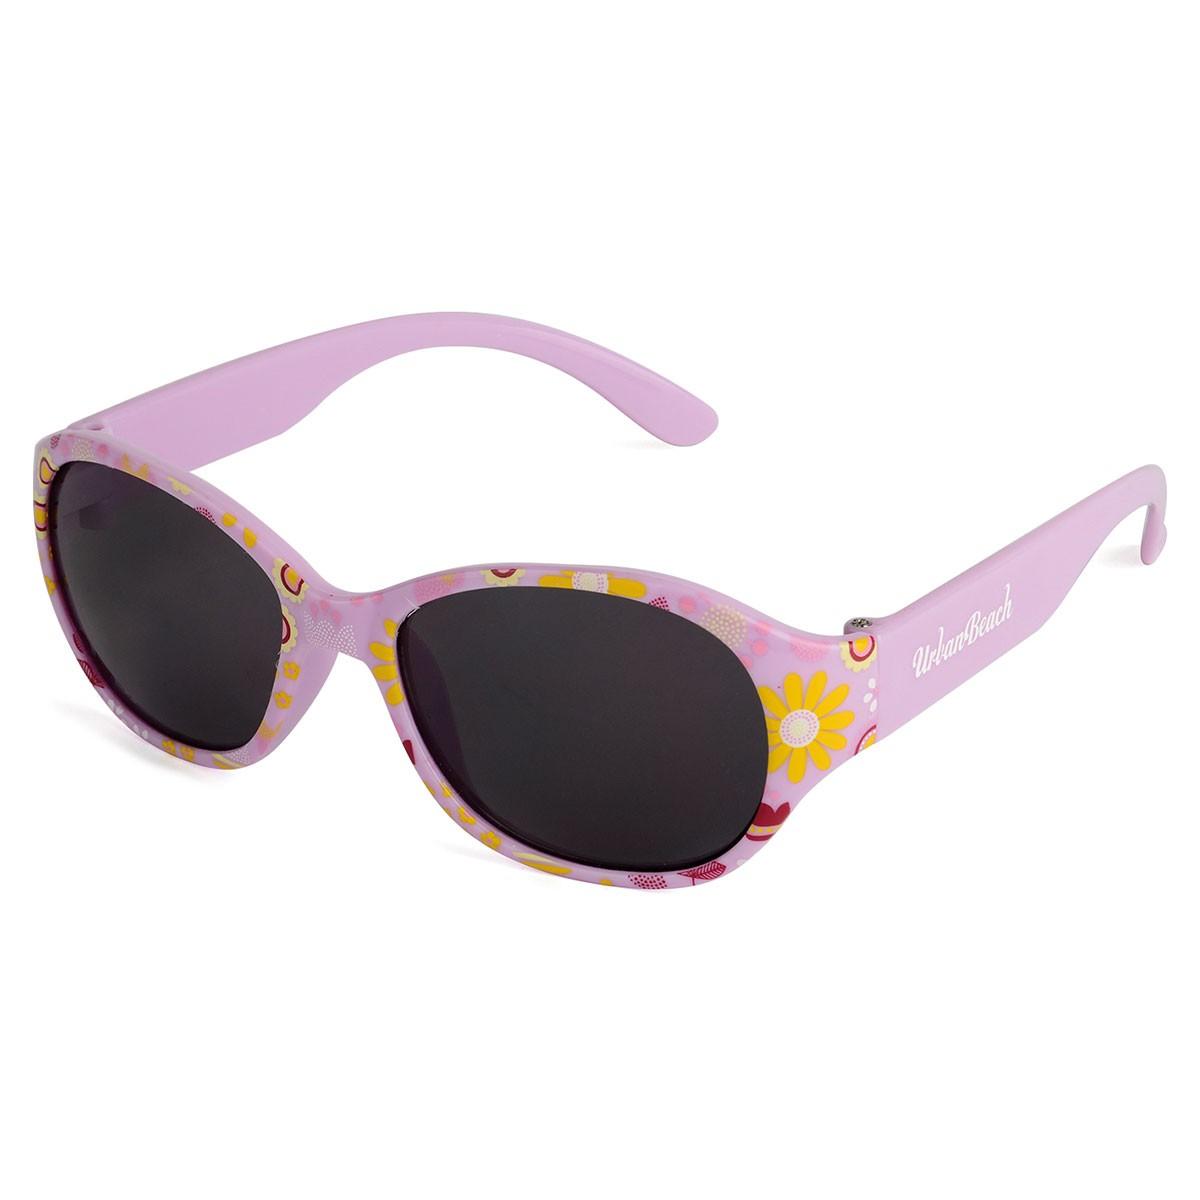 Urban Beach Sunglasses